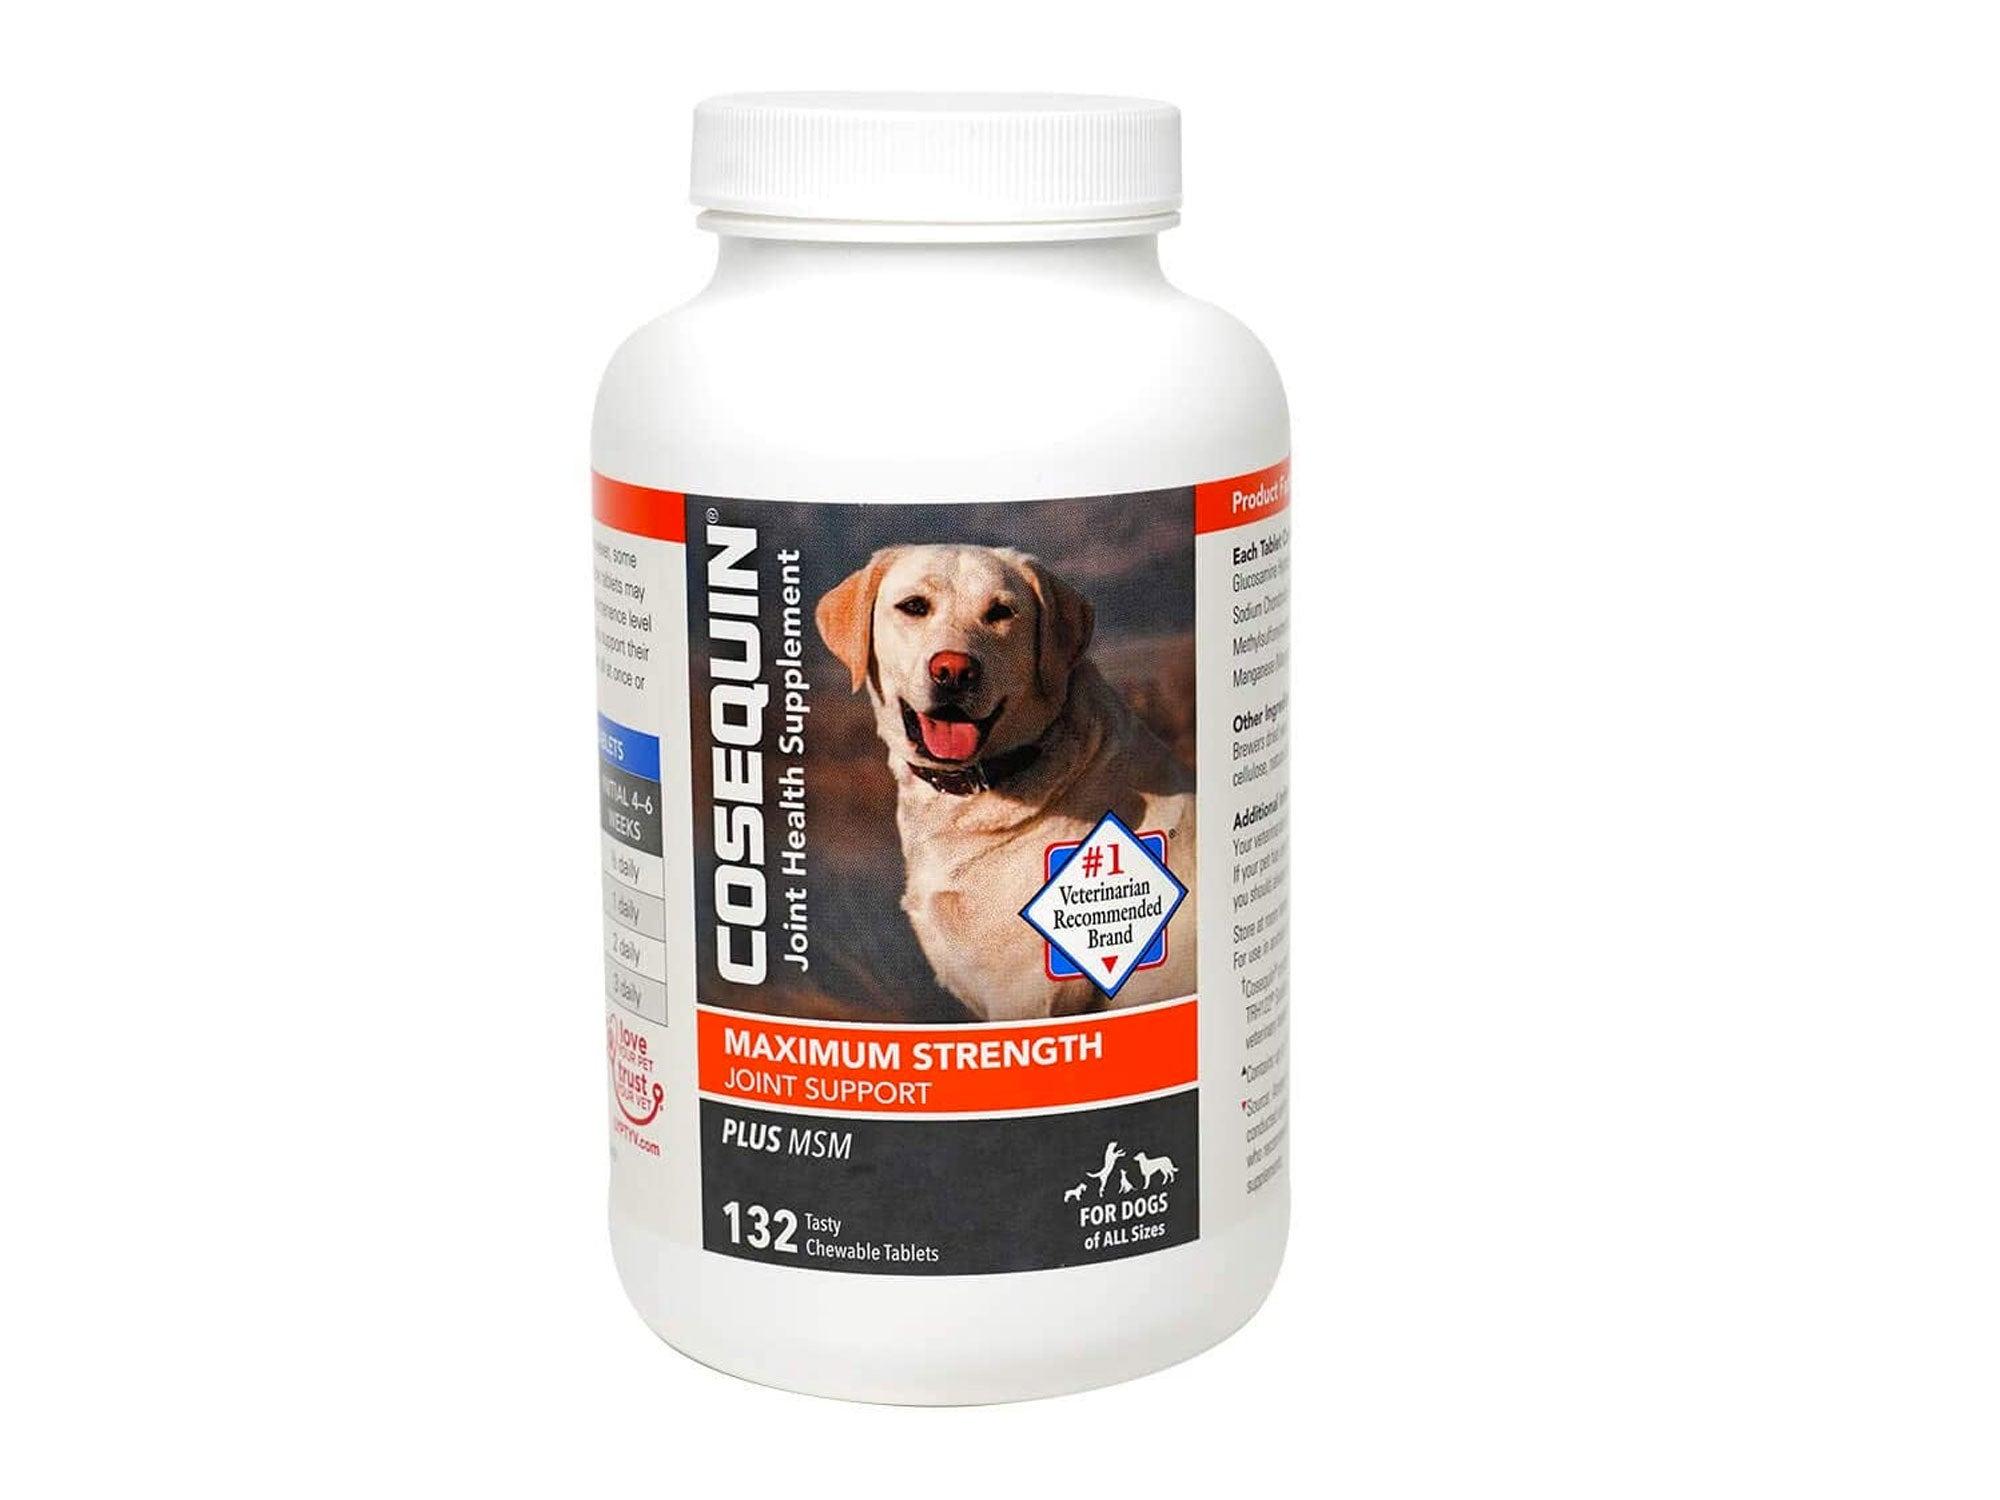 Cosequin Maximum Strength Joint Supplement Plus MSM